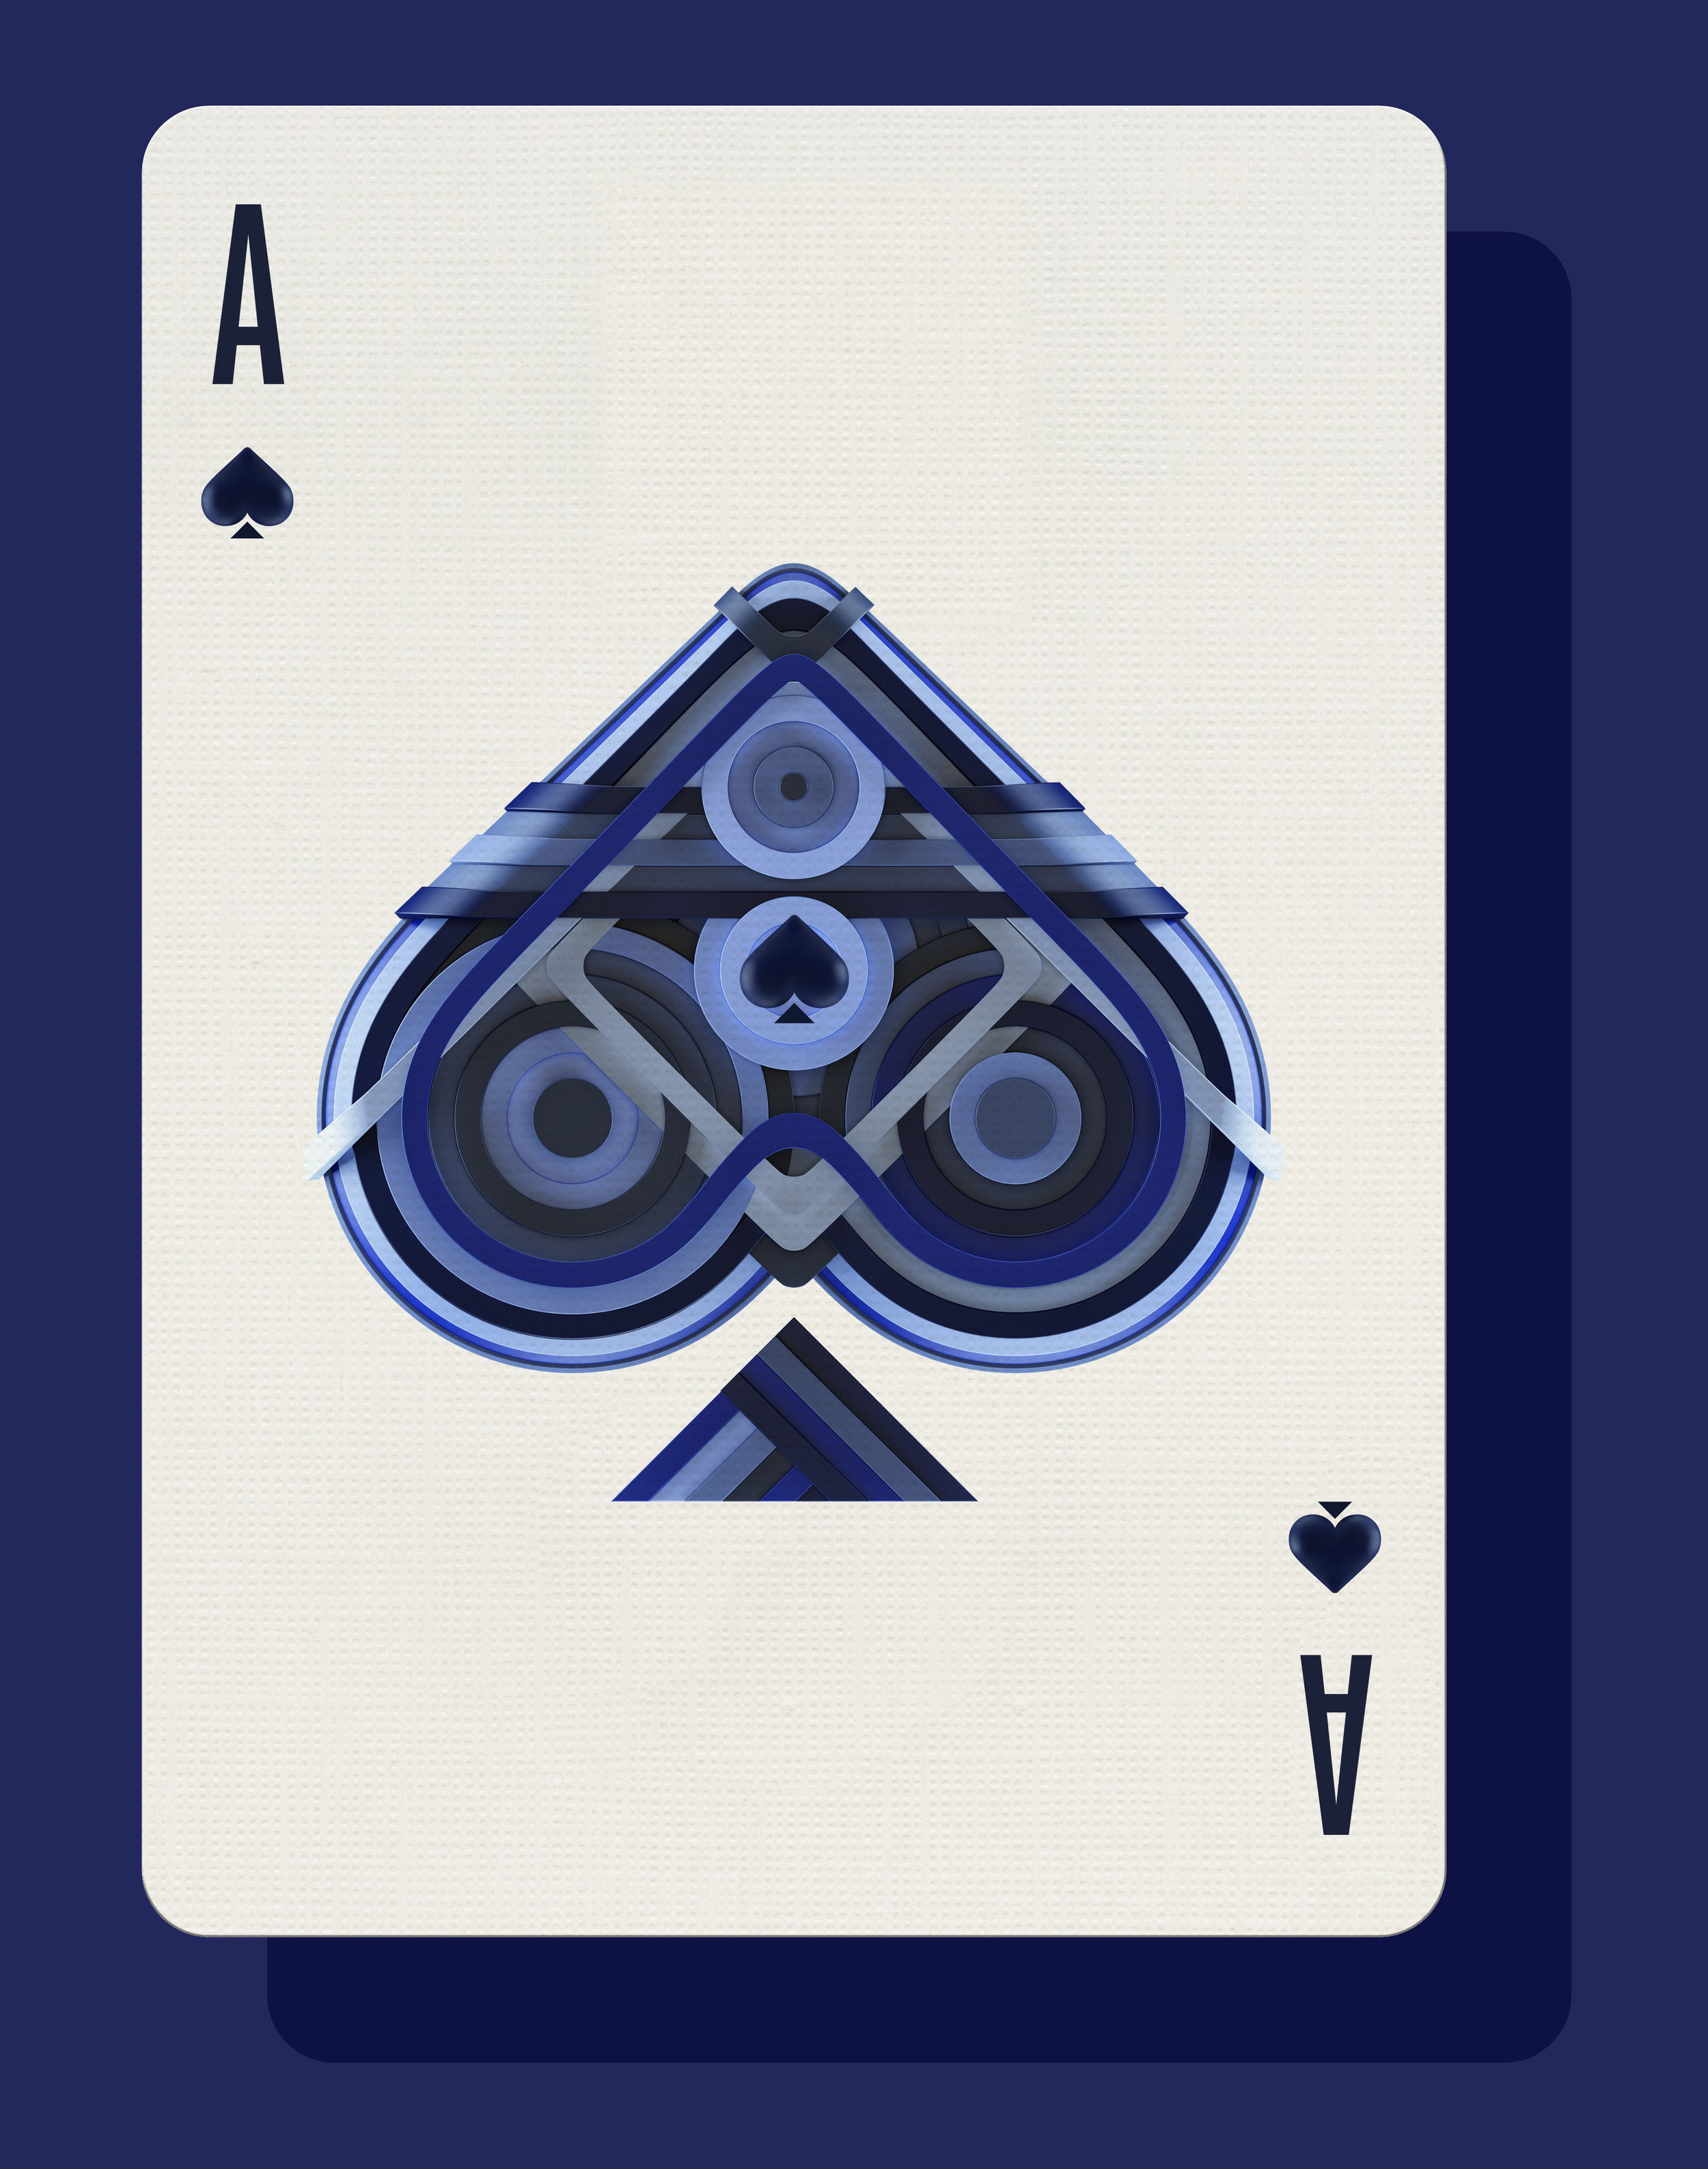 ACE_spades.jpg